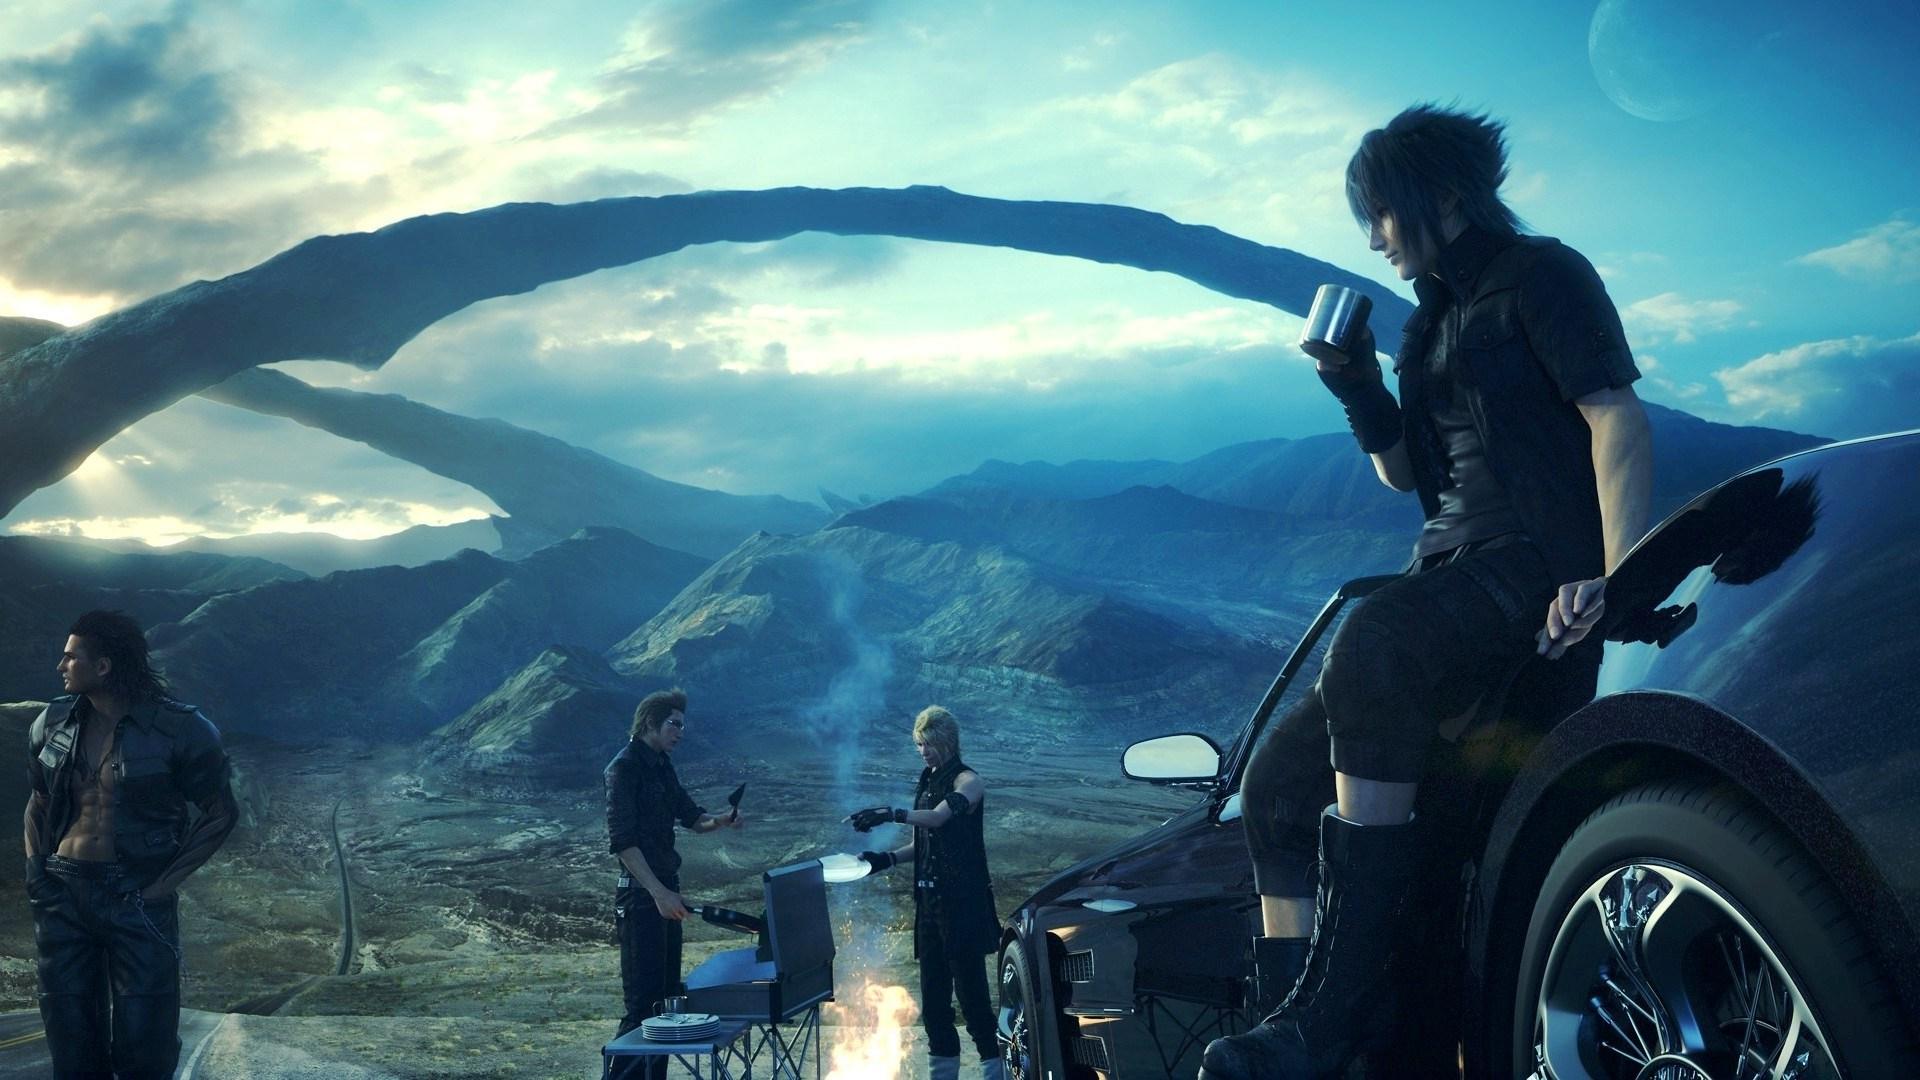 Final Fantasy 15 به طور همزمان در سراسر دنیا به بازار عرضه خواهد شد